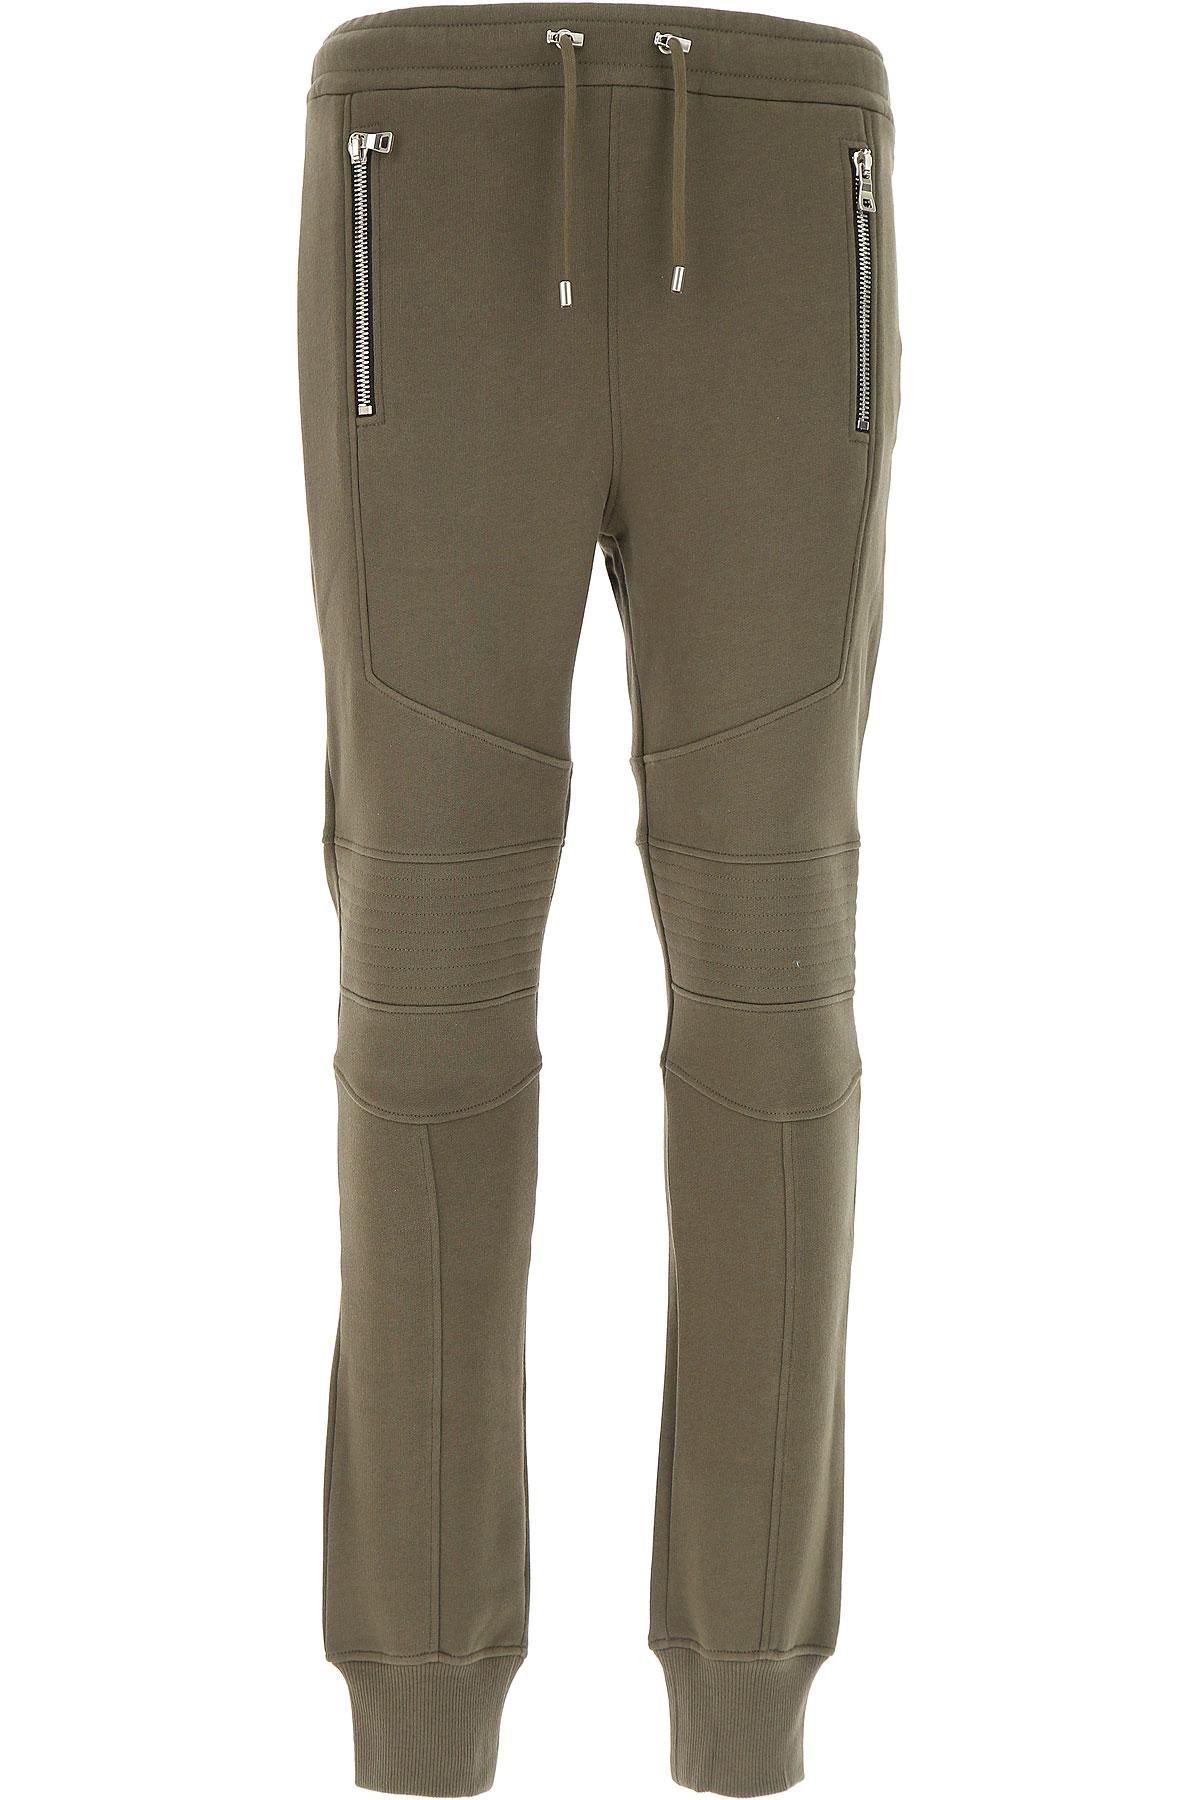 Image of Balmain Sweatpants, Military Green, Cotton, 2017, L M S